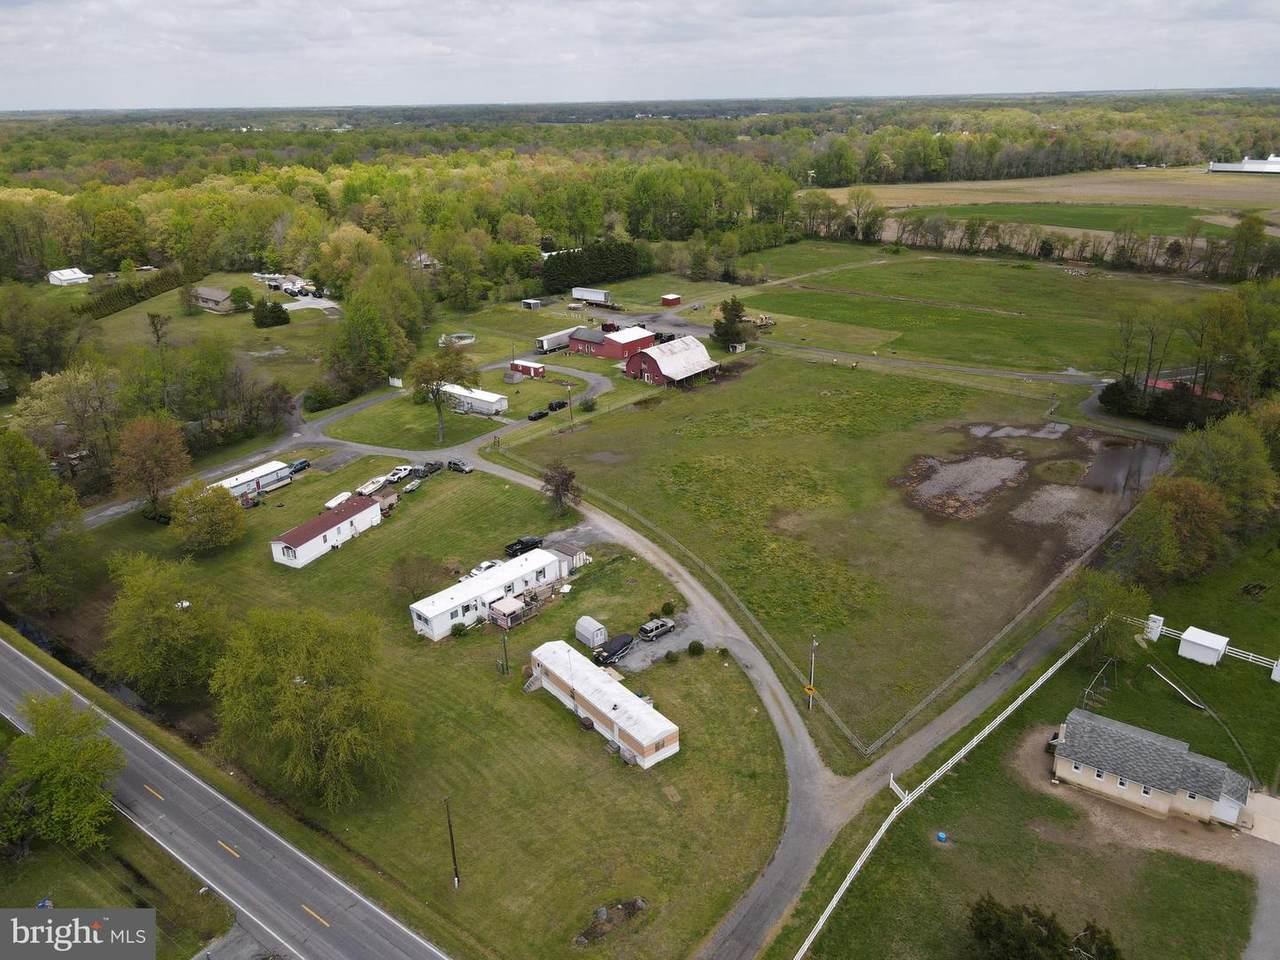 84 Spotted Acres Farm Lane - Photo 1